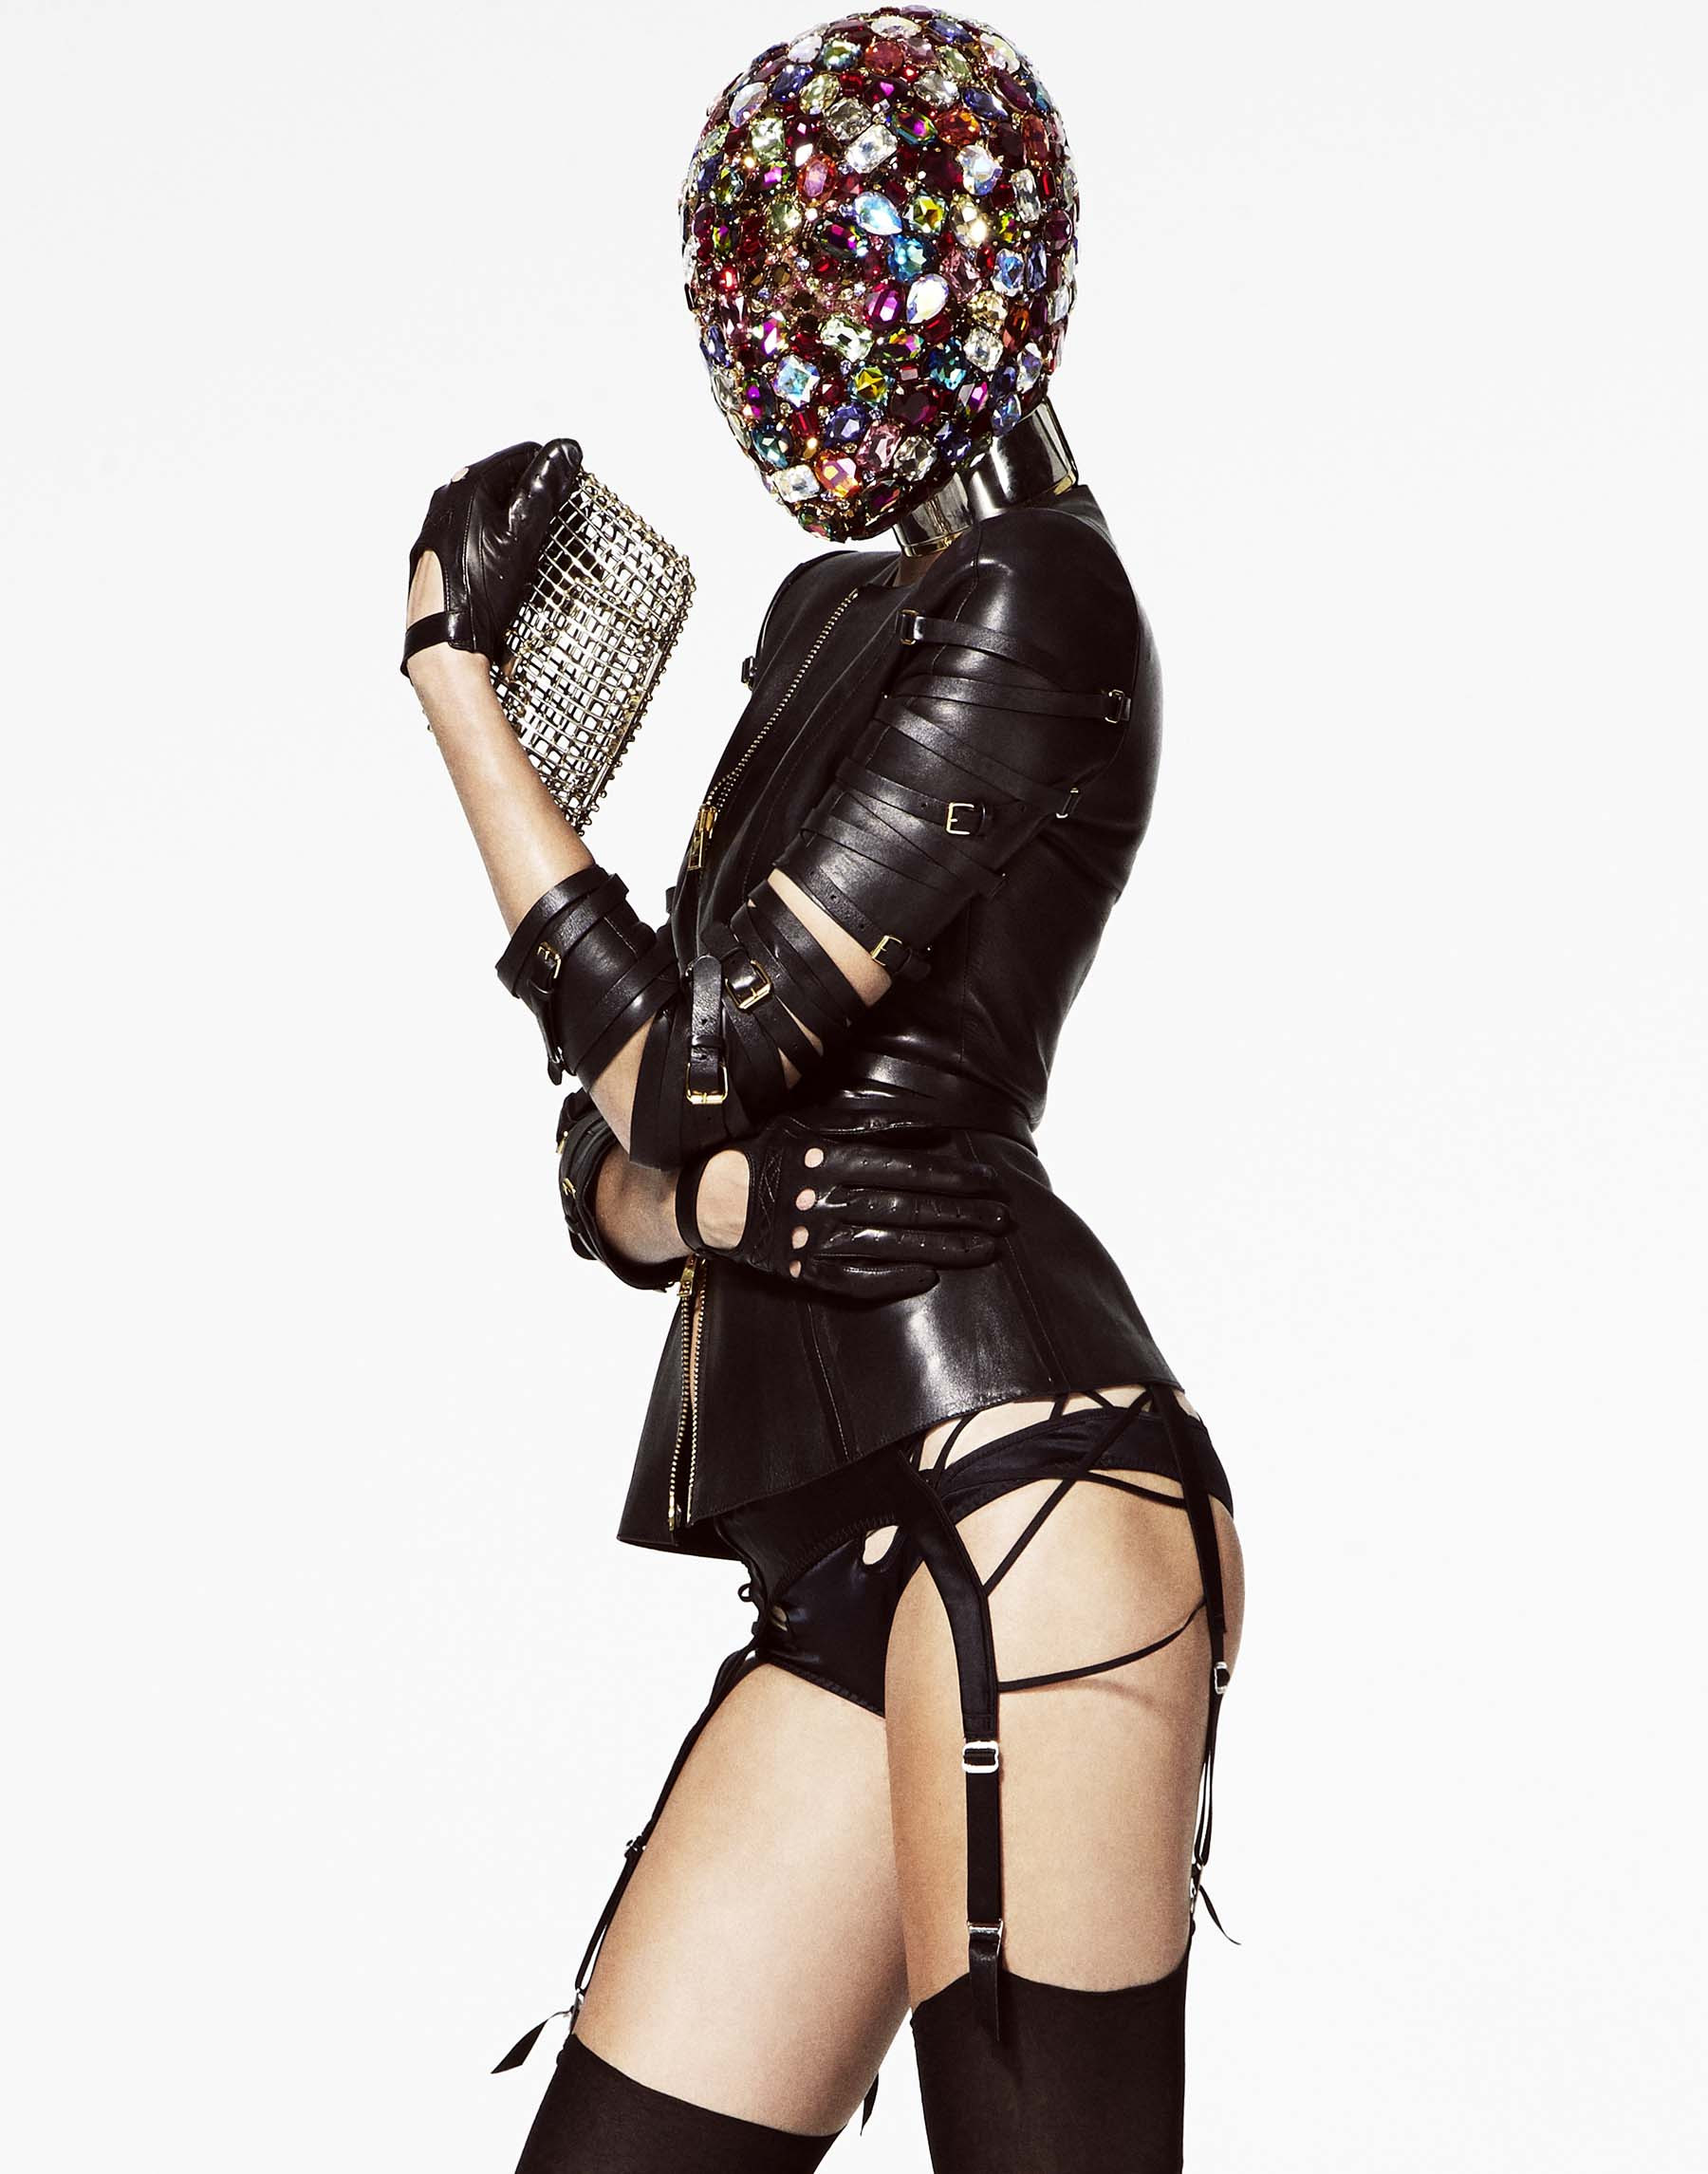 Tom Ford & Phillip Treacy / Josephine Skriver / V Magazine